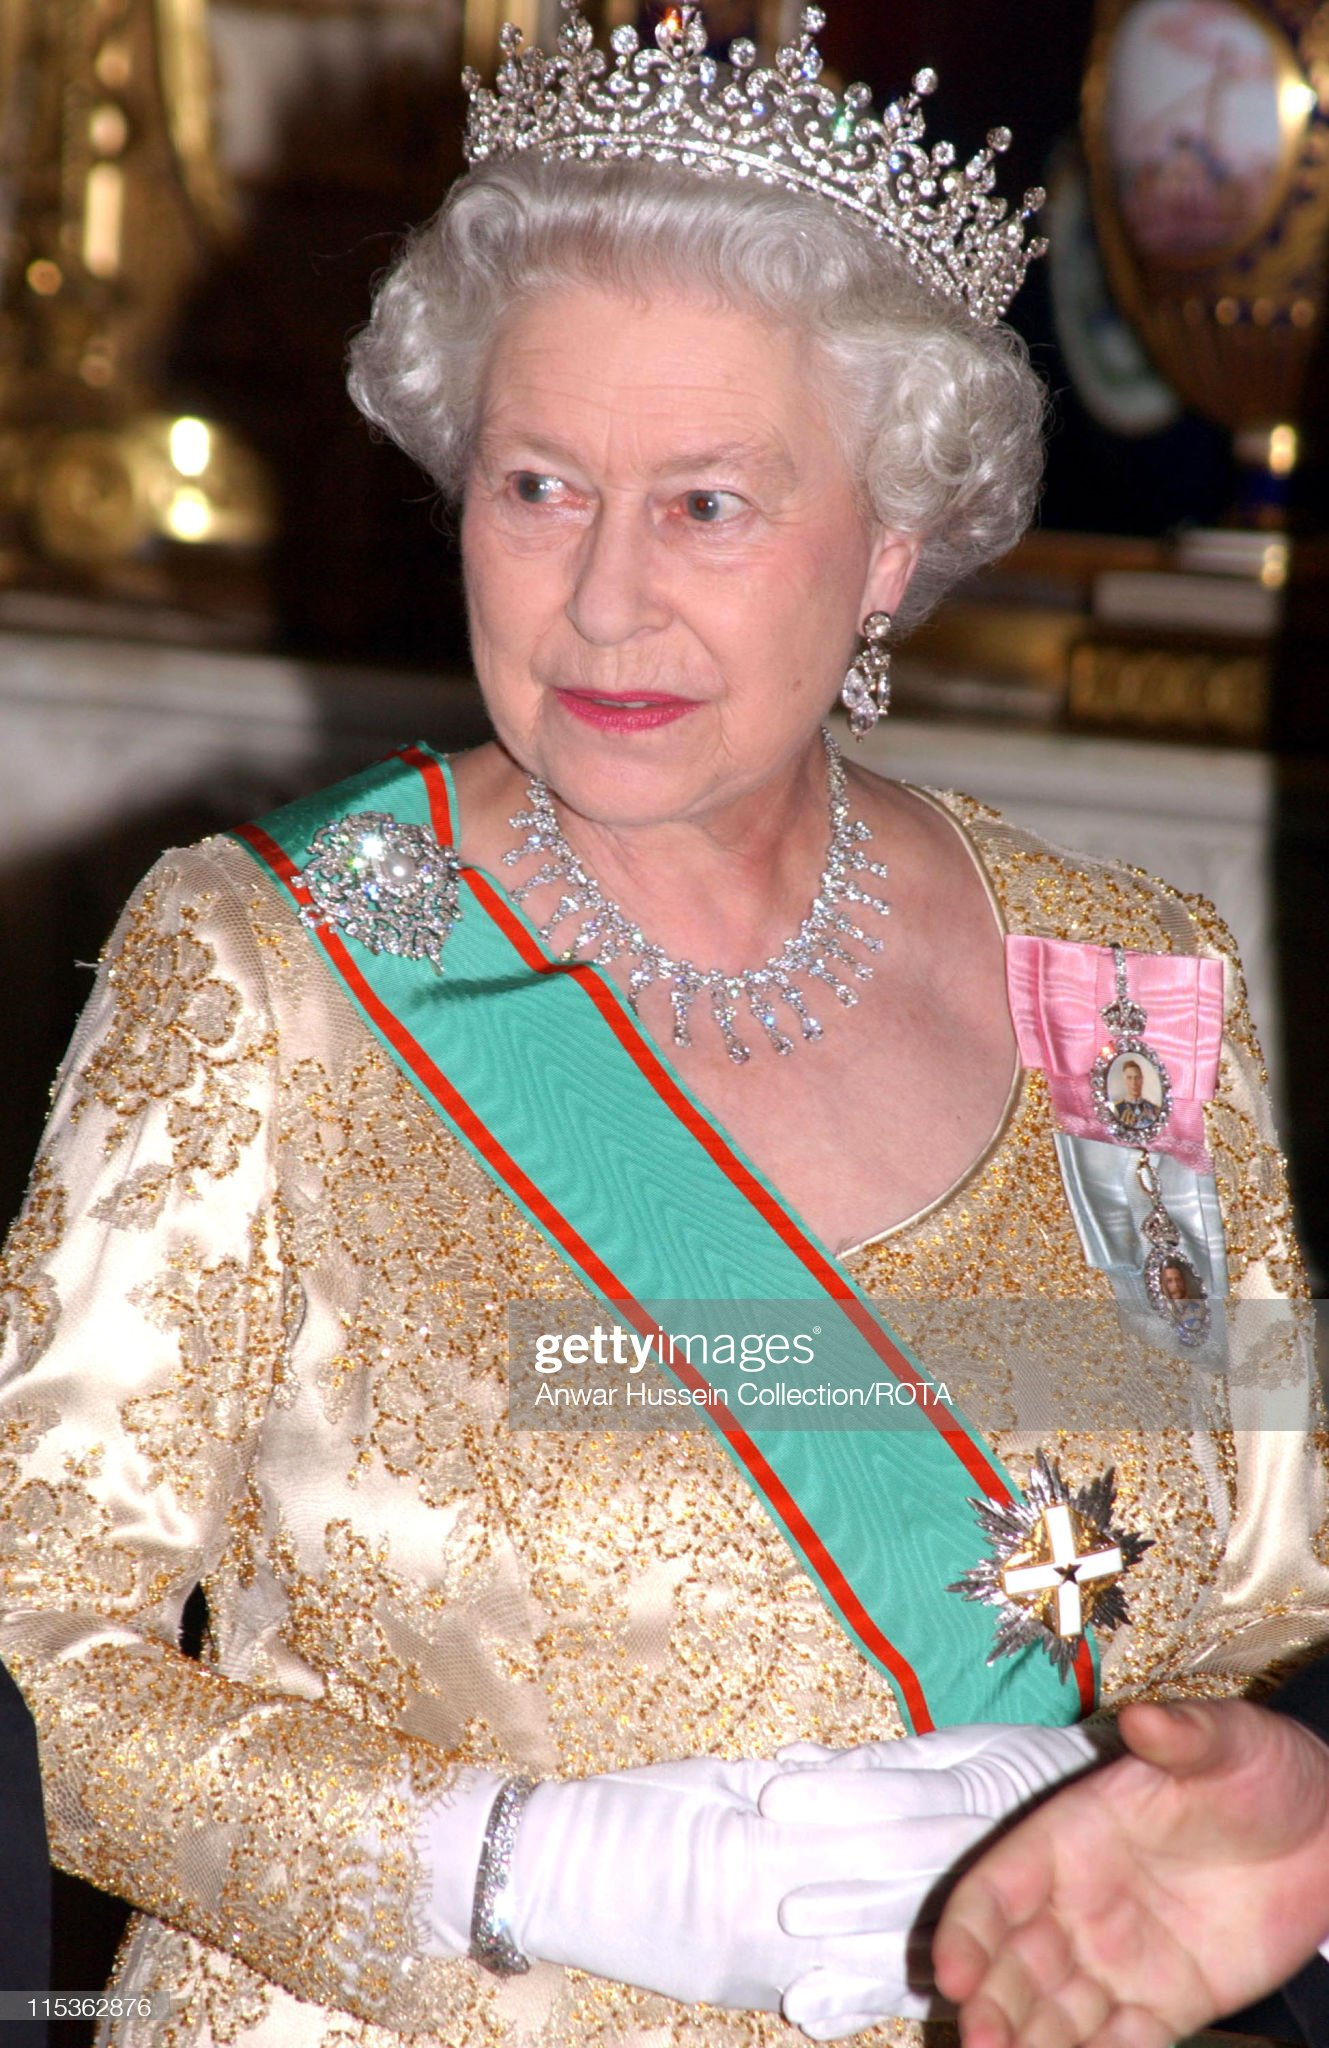 HRH Queen Elizabeth II Welcomes Italian President Carlo Azeglio Ciampi With A State Banquet : News Photo